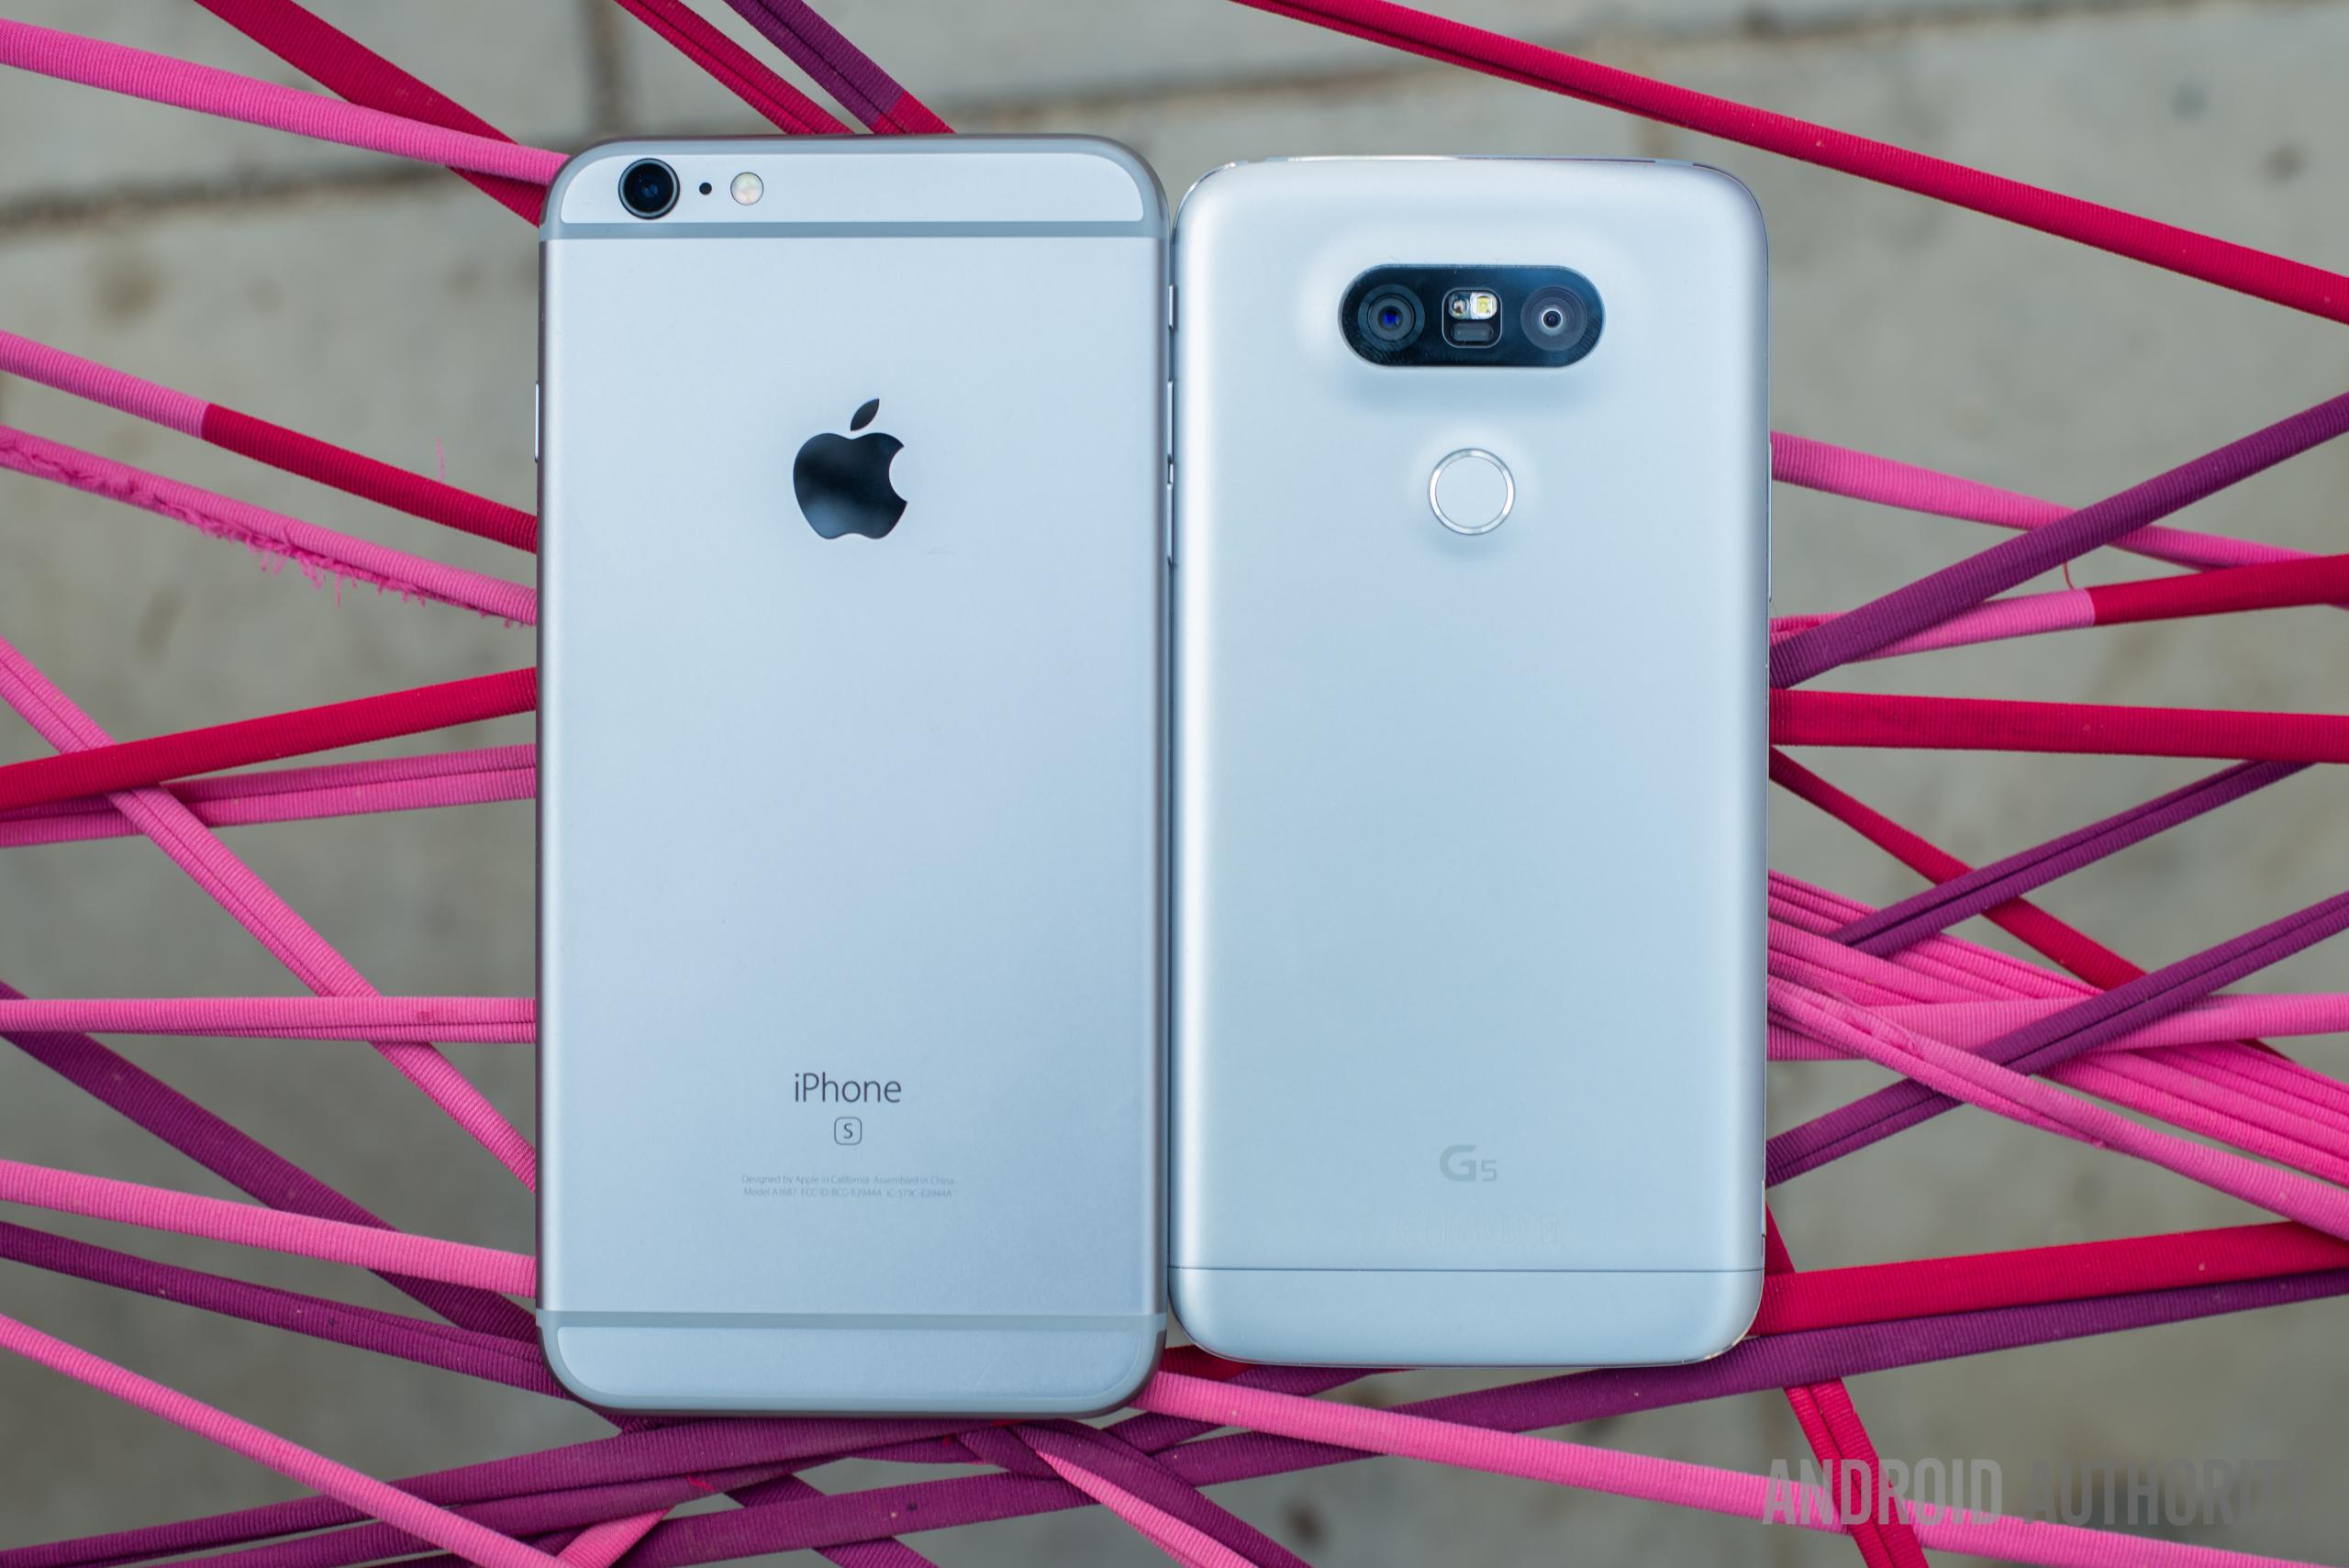 Samsung galaxy s7 vs lg g5 vs apple iphone 6s vs samsung galaxy s6 - Samsung Galaxy S7 Vs Lg G5 Vs Apple Iphone 6s Vs Samsung Galaxy S6 13